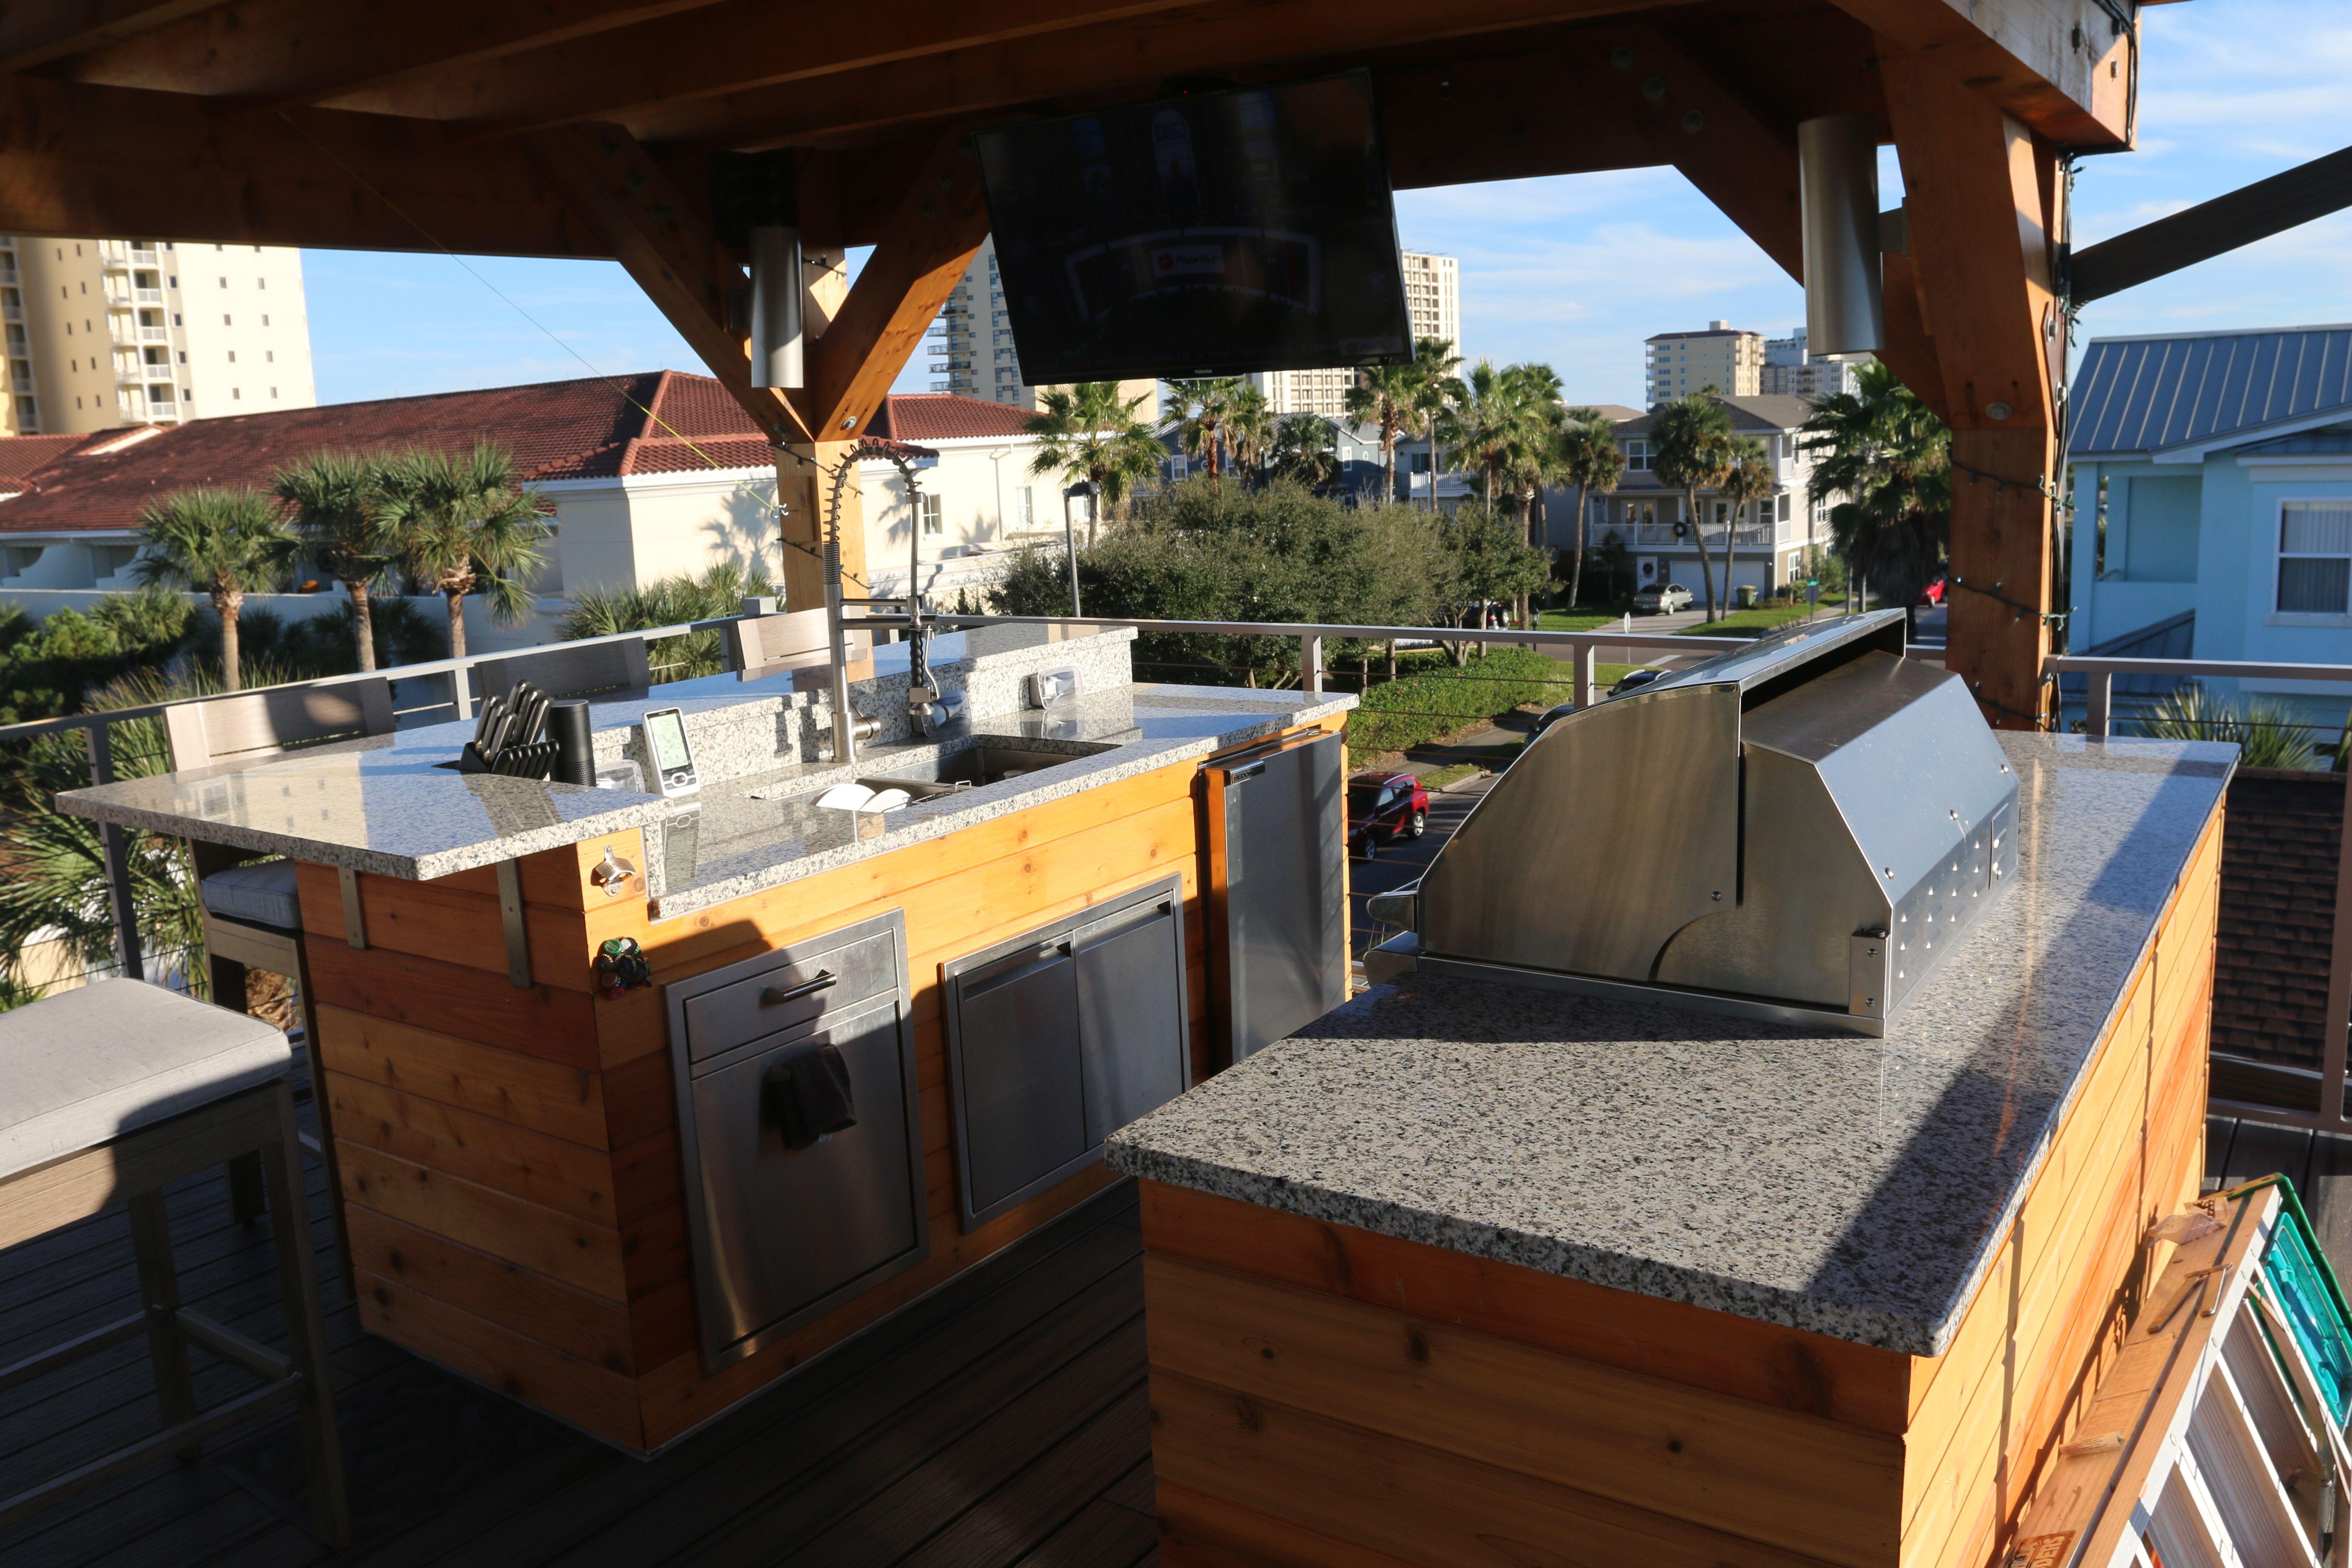 Rooftop Deck Summer Kitchen Beach House Exterior Summer Kitchen Rooftop Deck